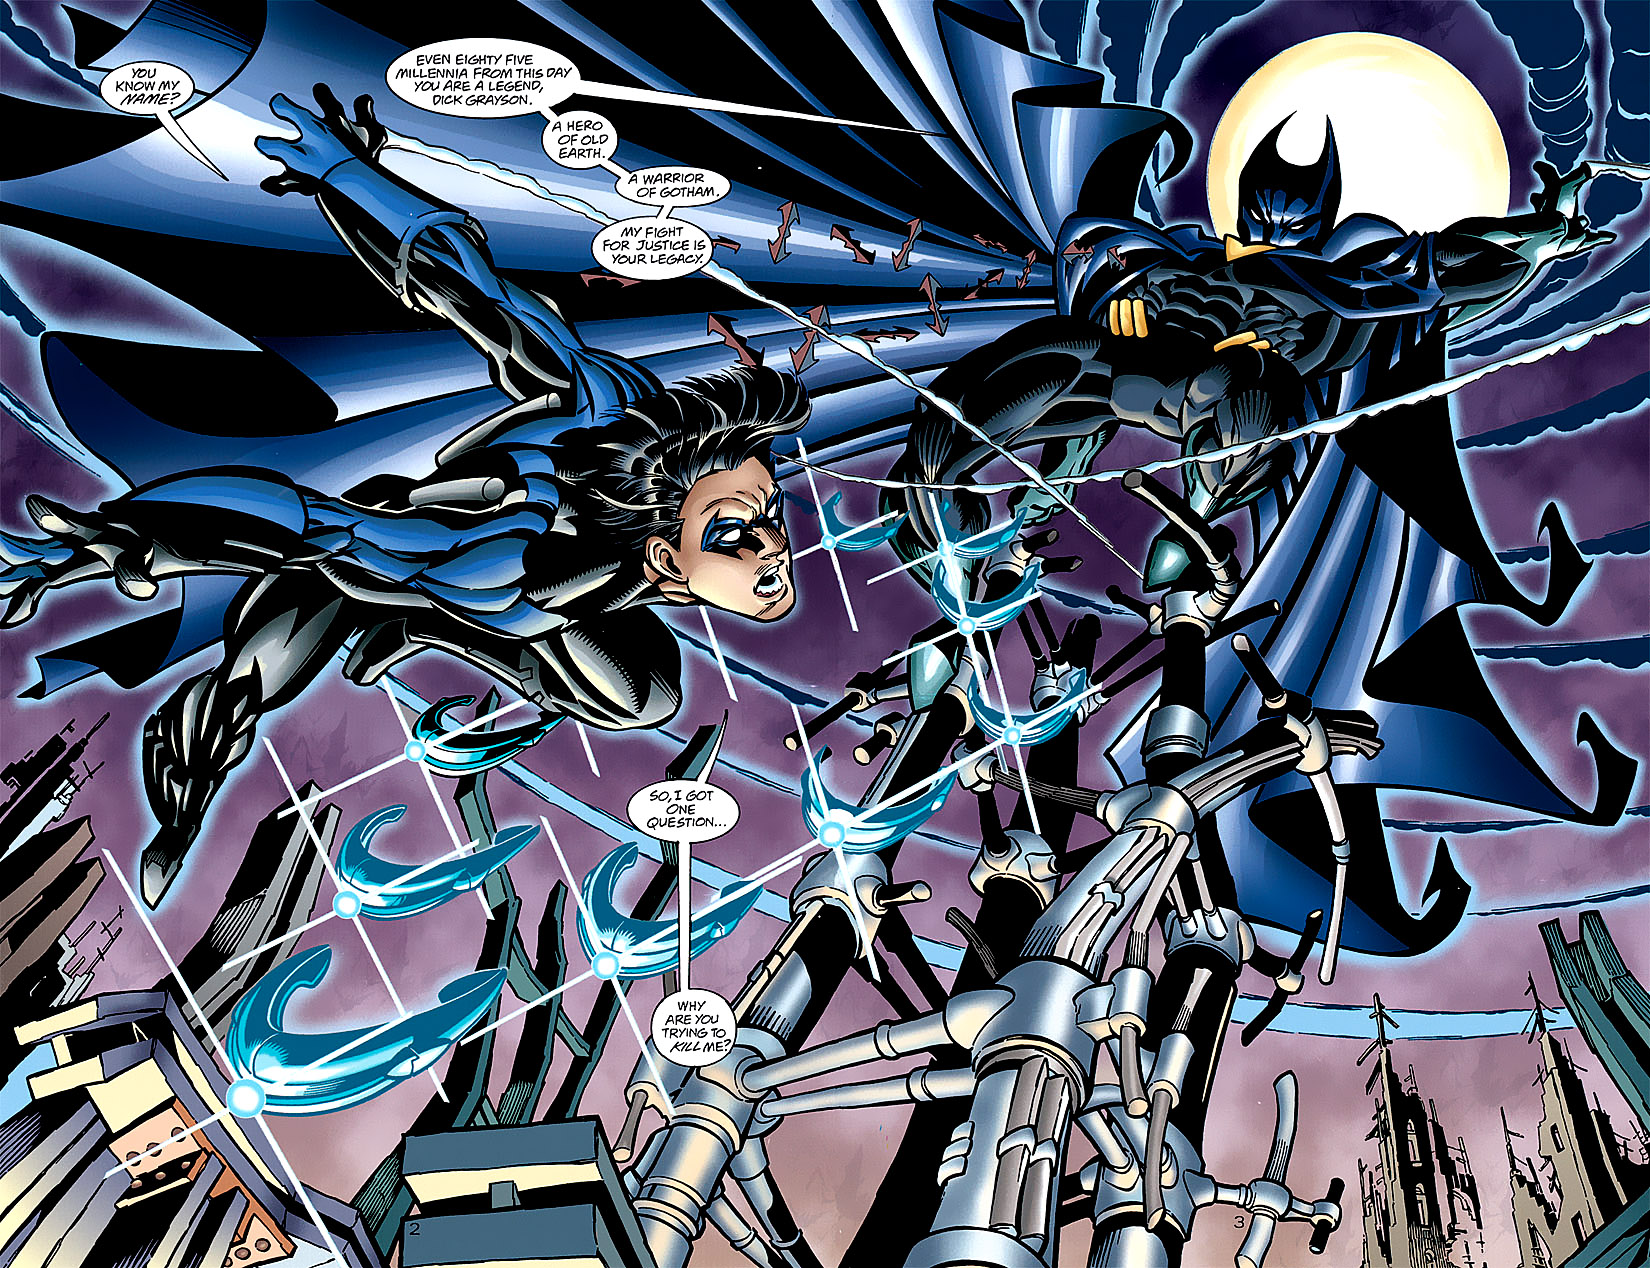 Nightwing (1996) chap 1000000 pic 4